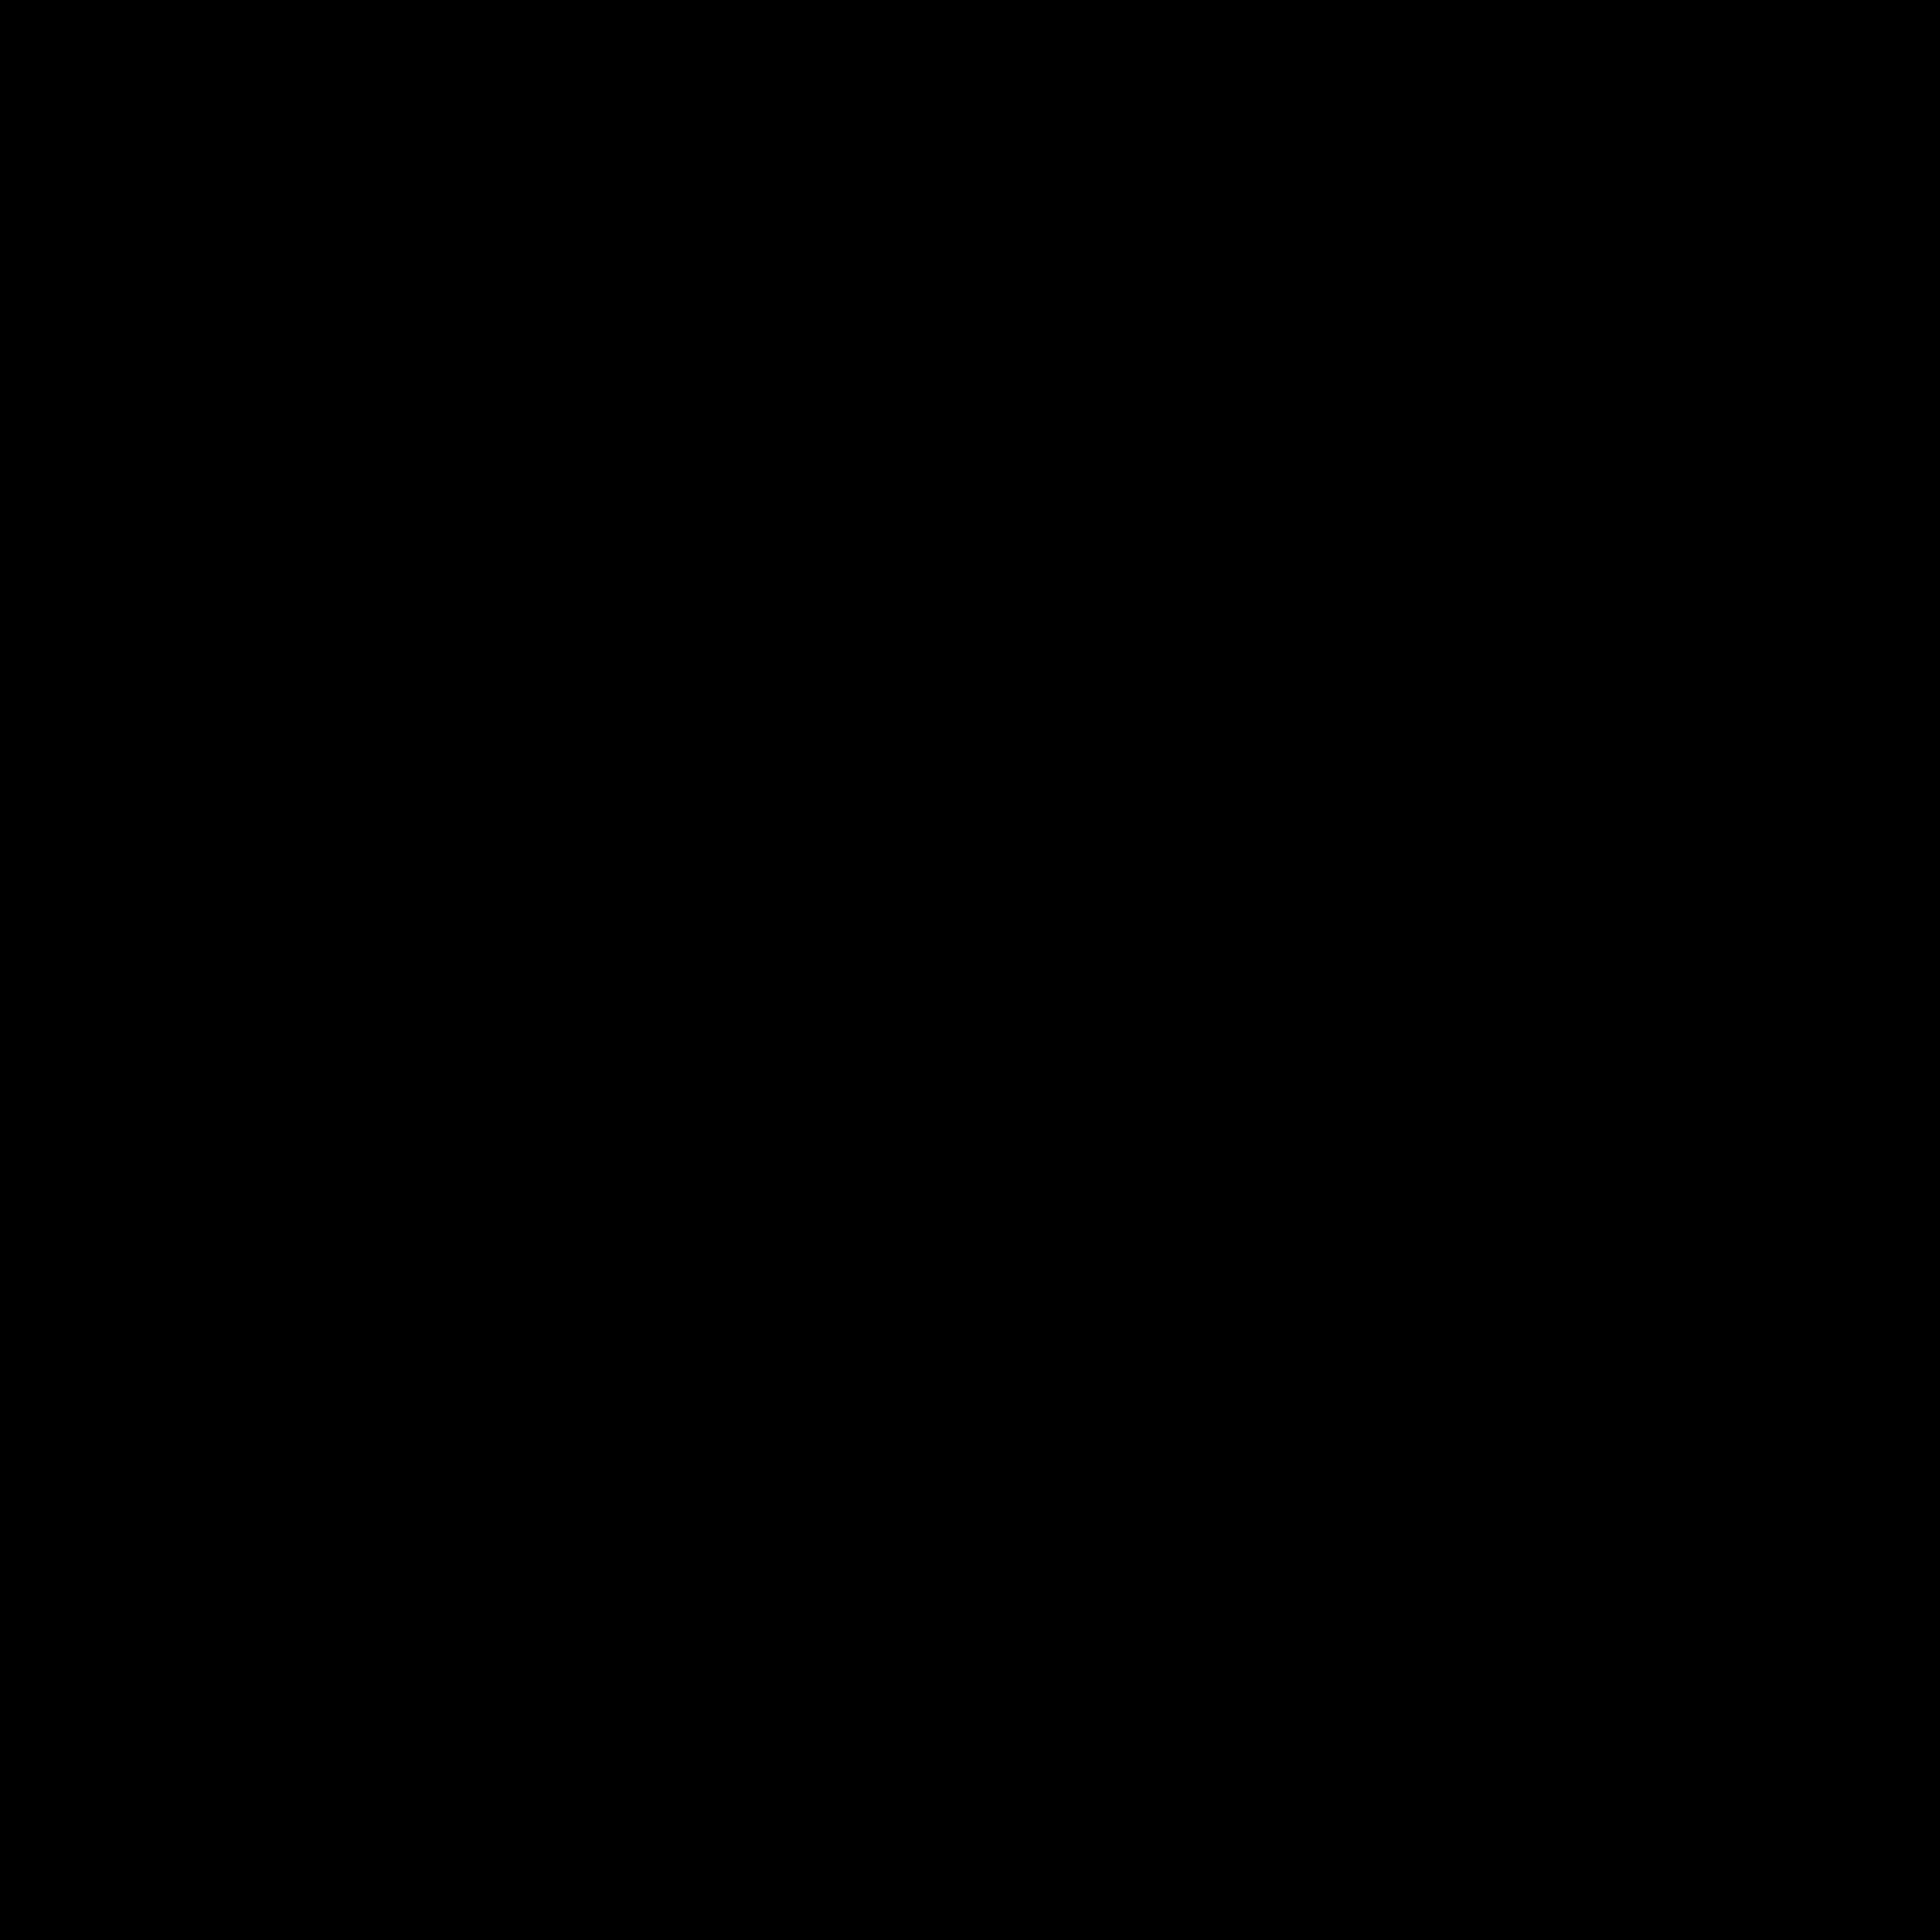 jordan logo 0 - Jordan Logo